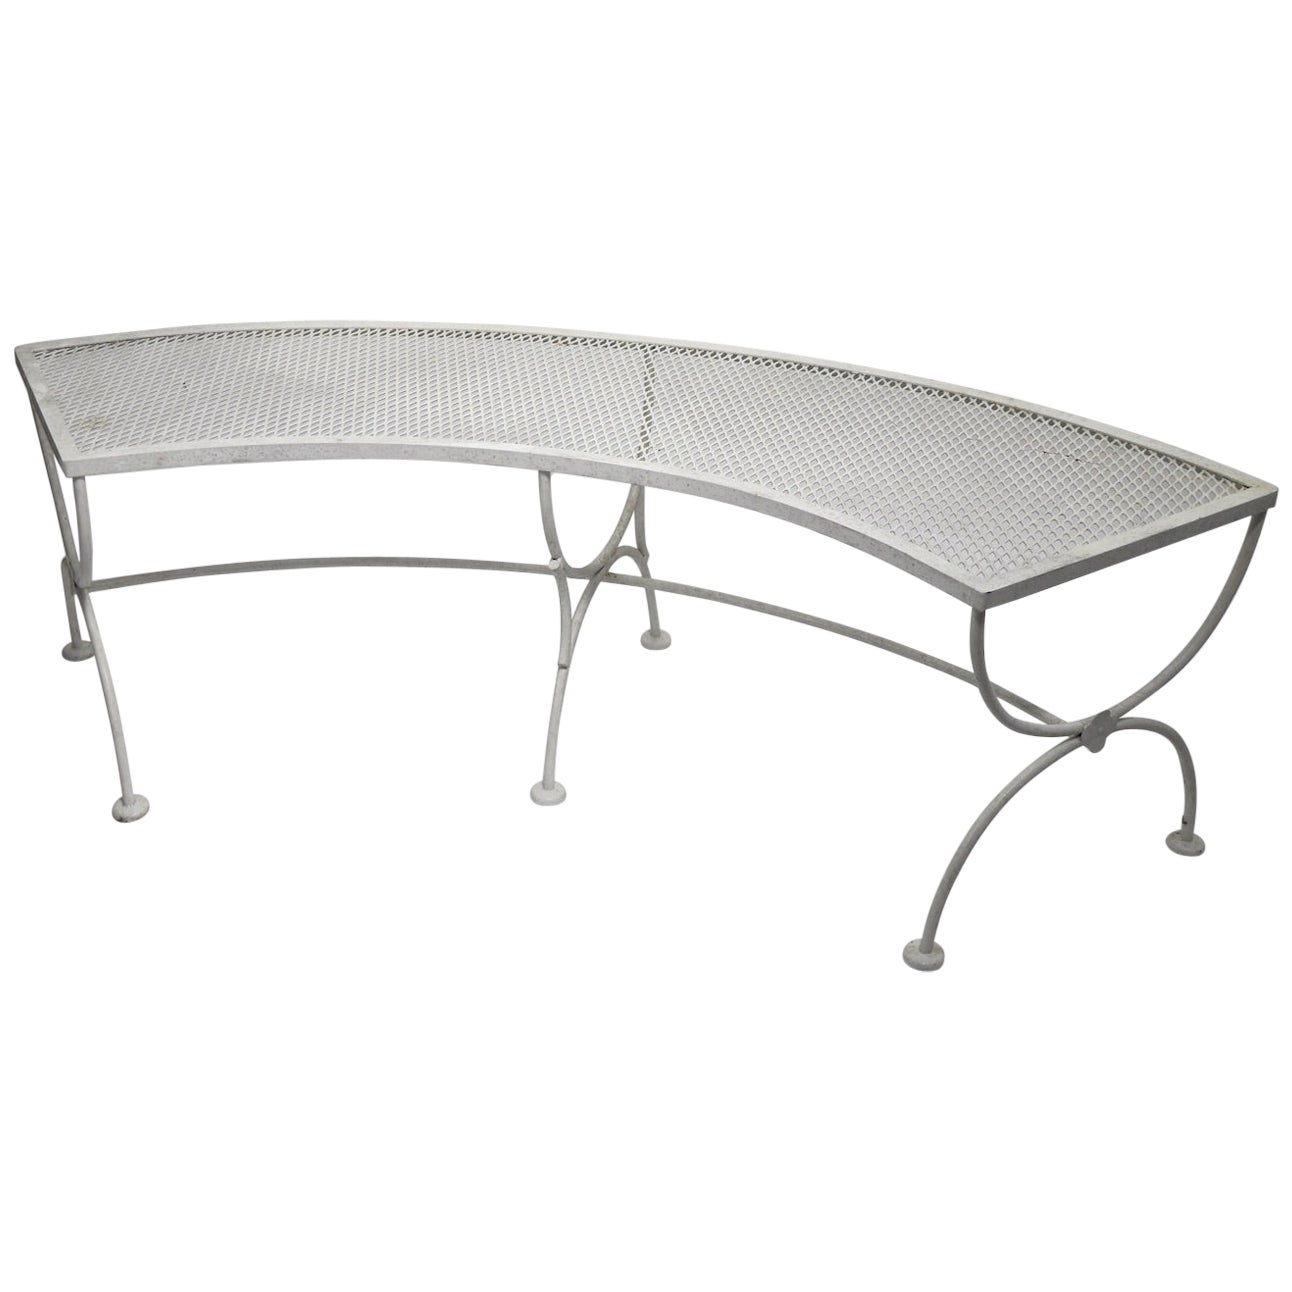 Wrought Iron Garden Patio Benches by Salterini 3 Available